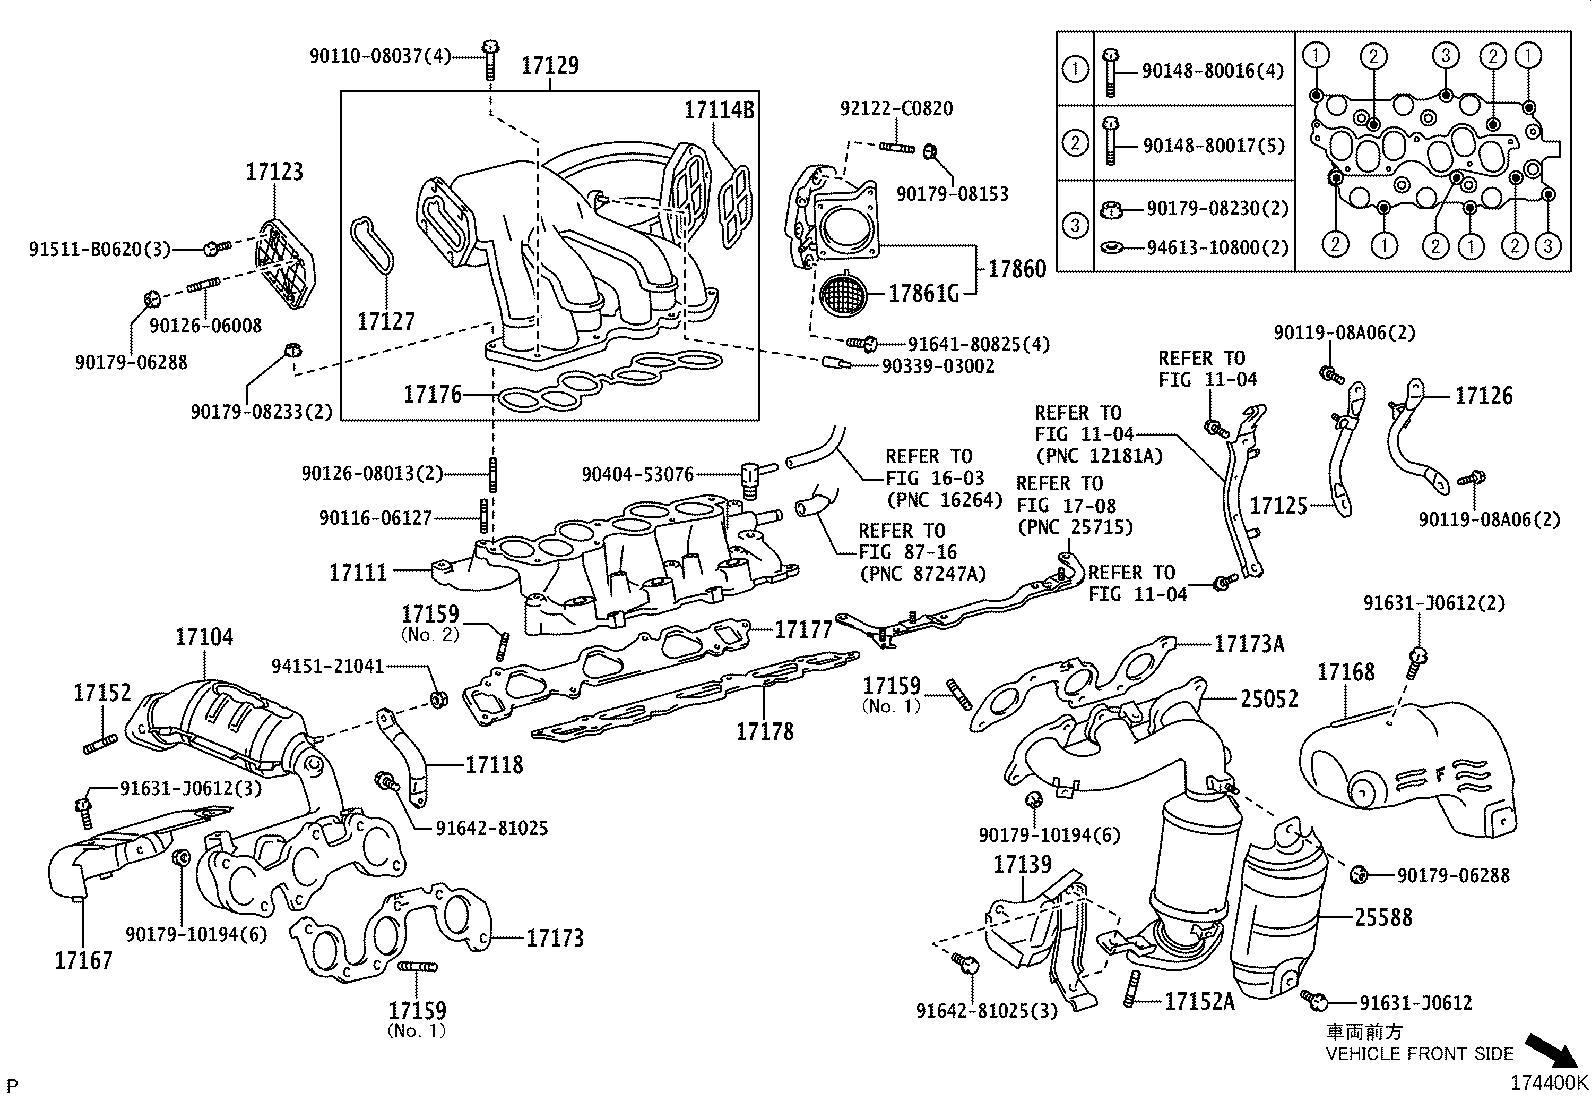 2008 Lexus Gasket, intake manifold to head, no. 1. Spec